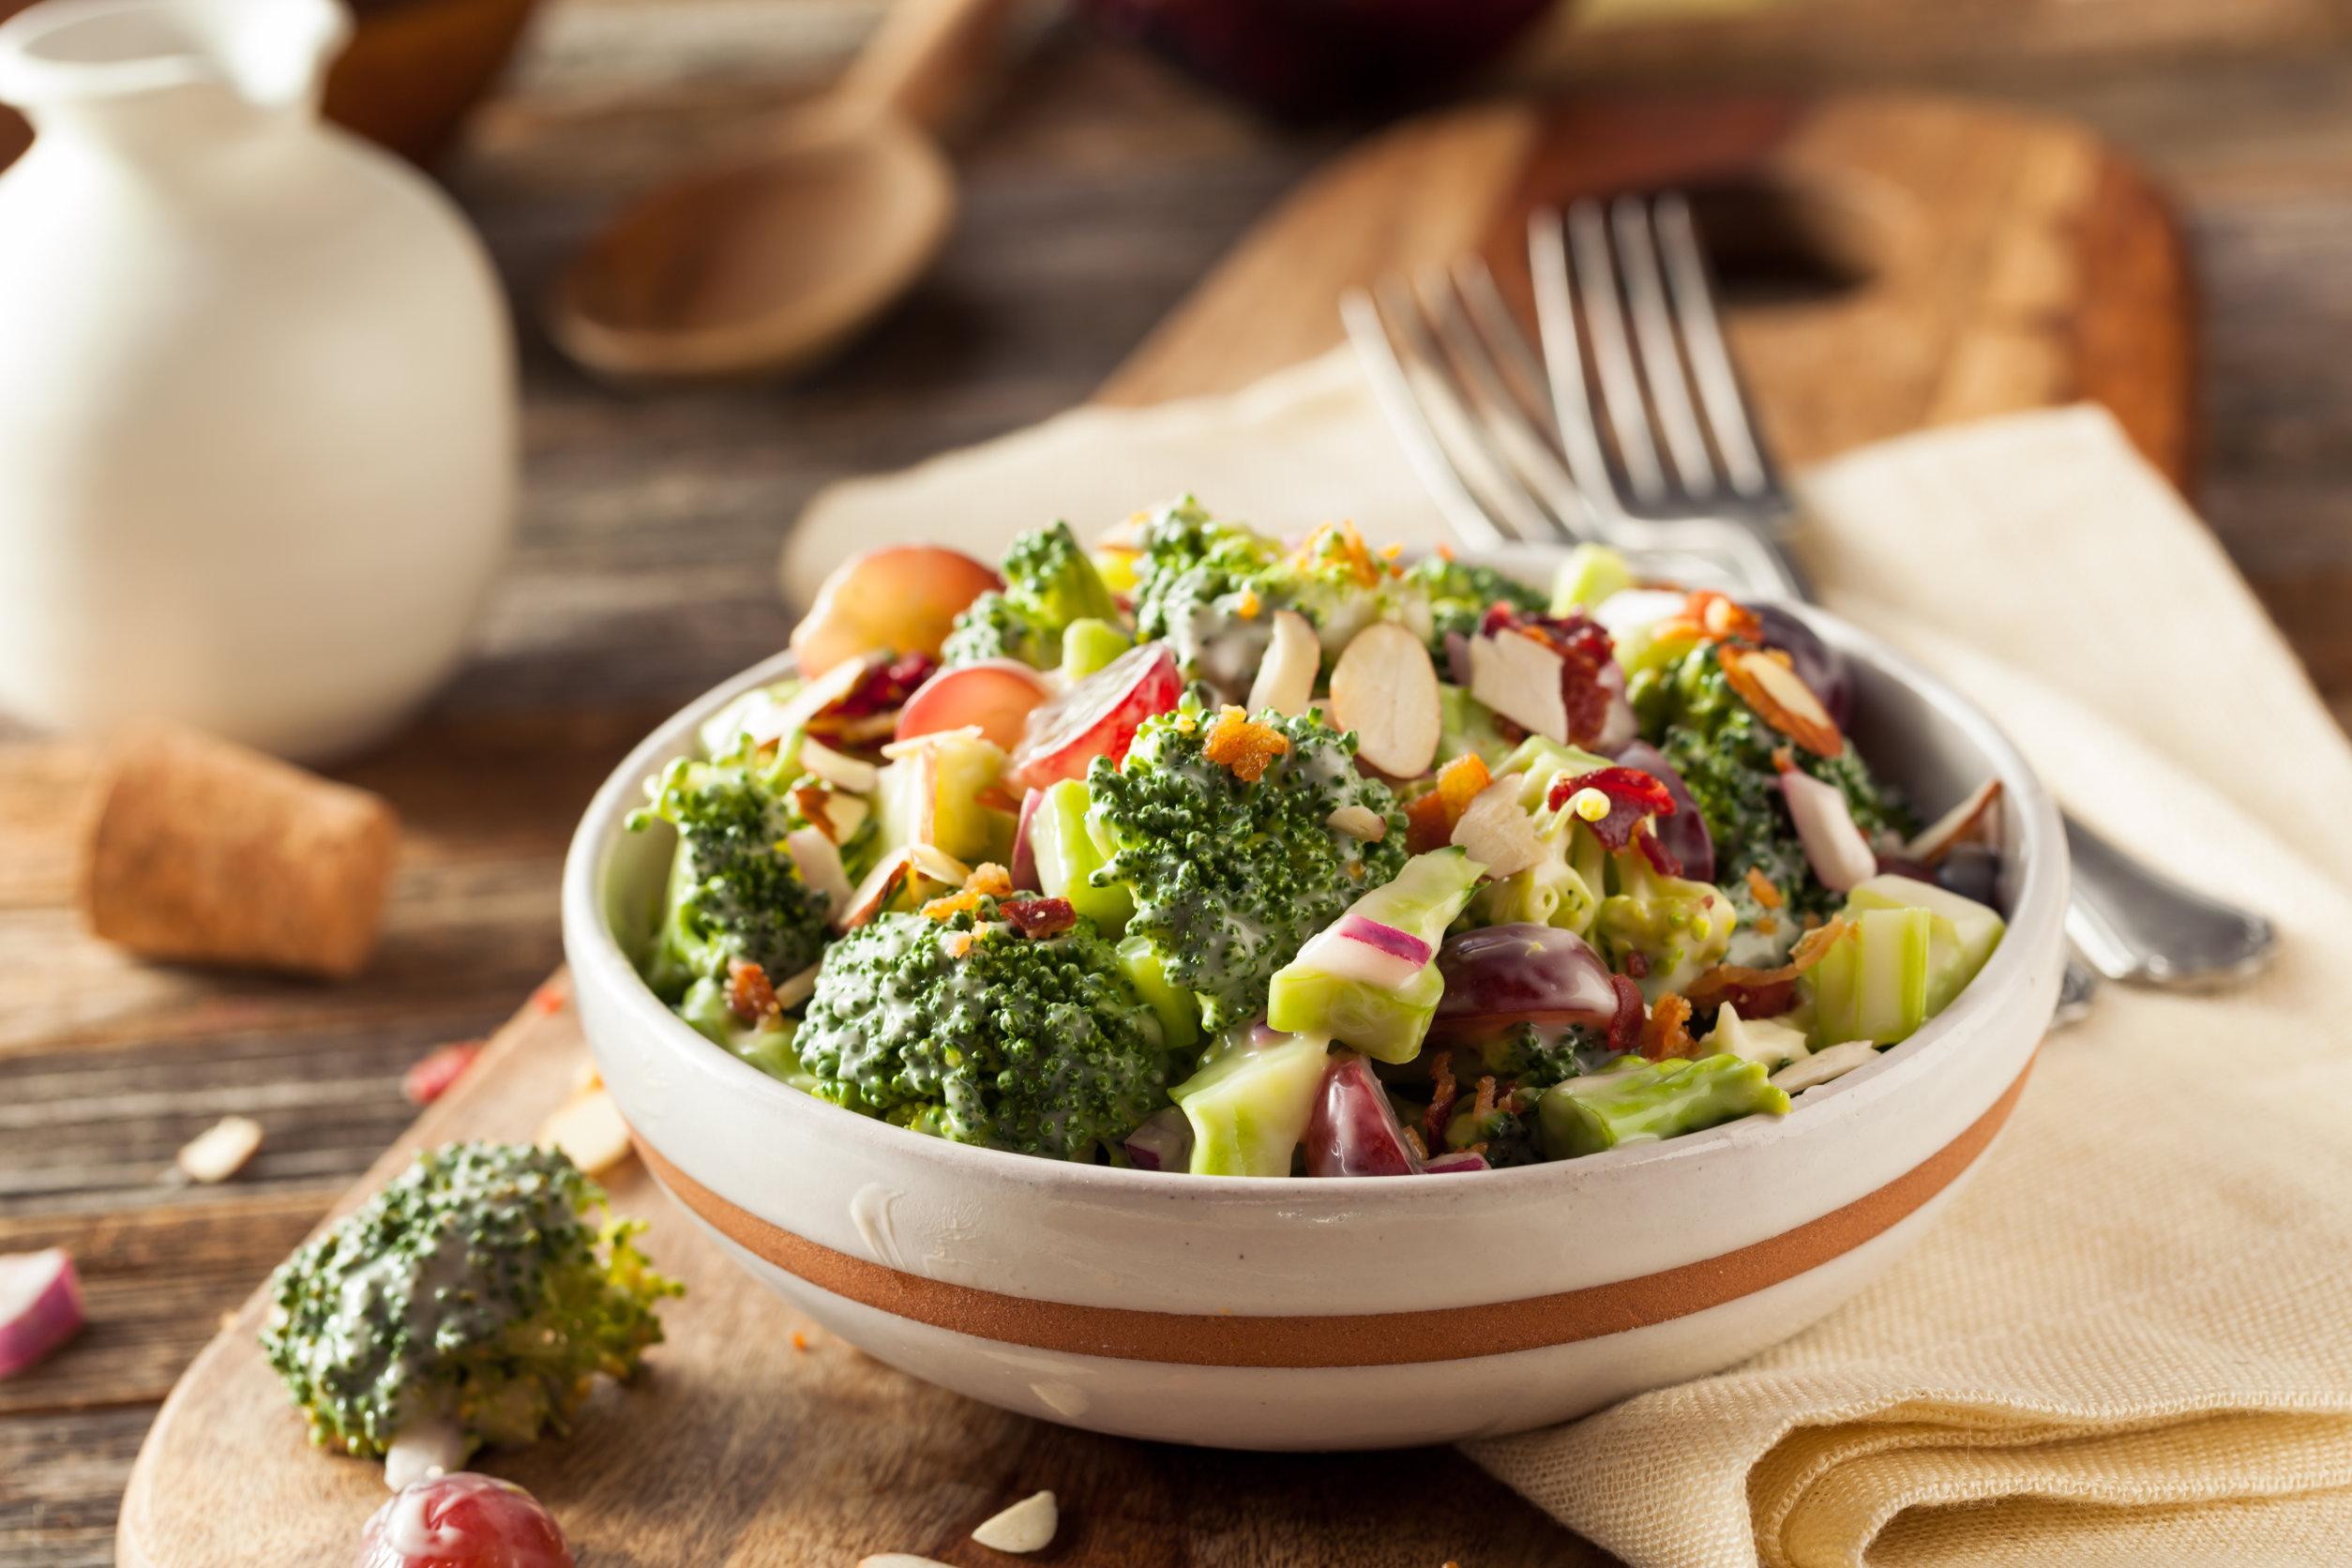 Maple Broccoli Salad with Bacon